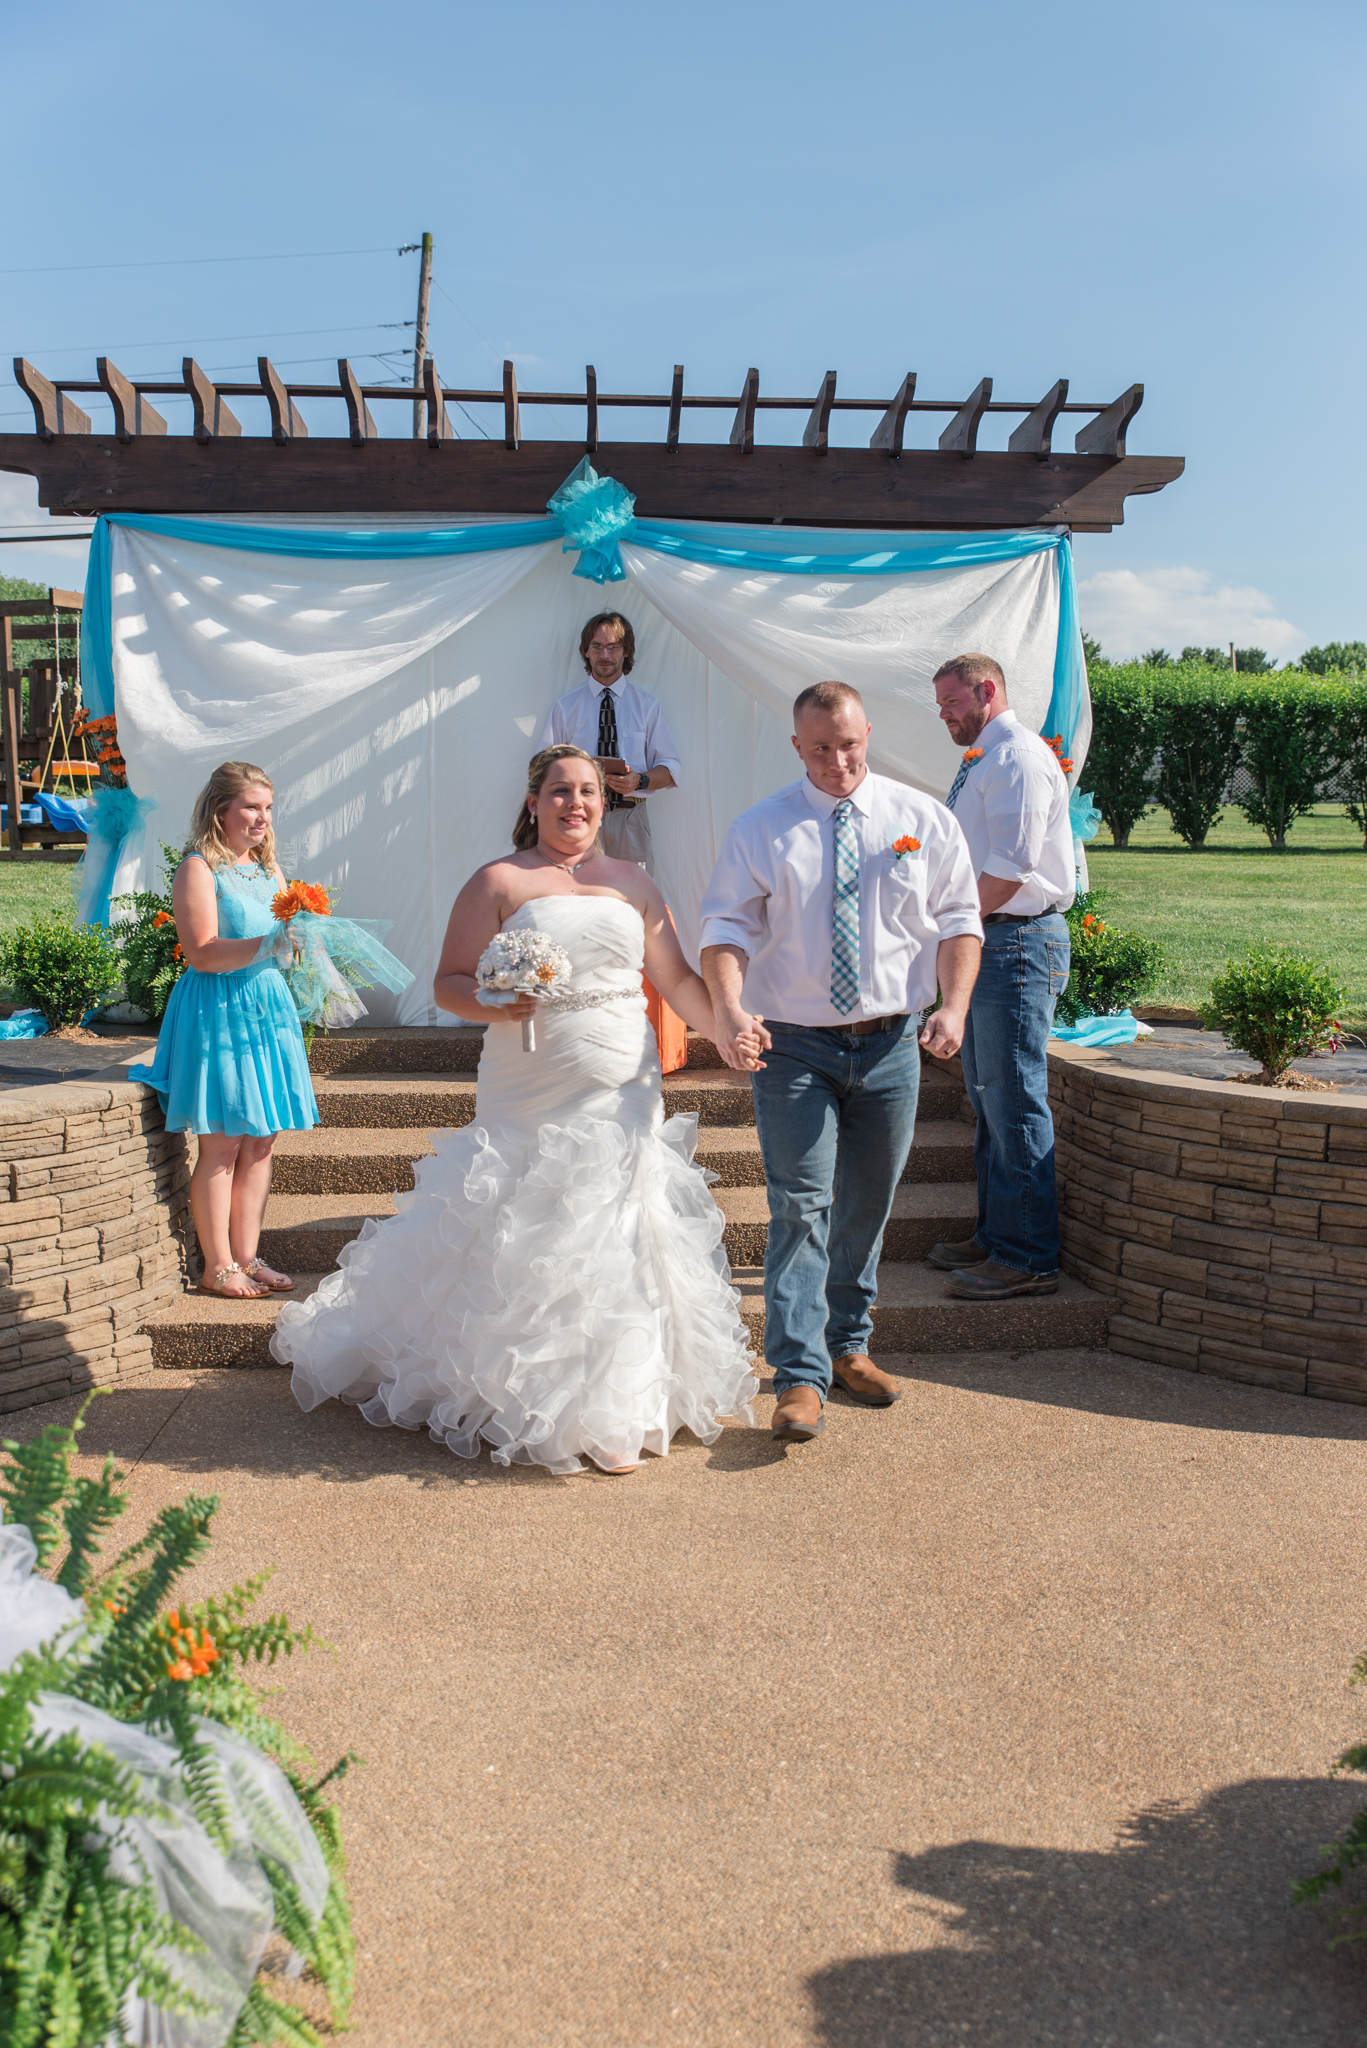 outdoor wedding, KY wedding, kentucky, Kentucky wedding, Kentucky wedding photos, KY bride